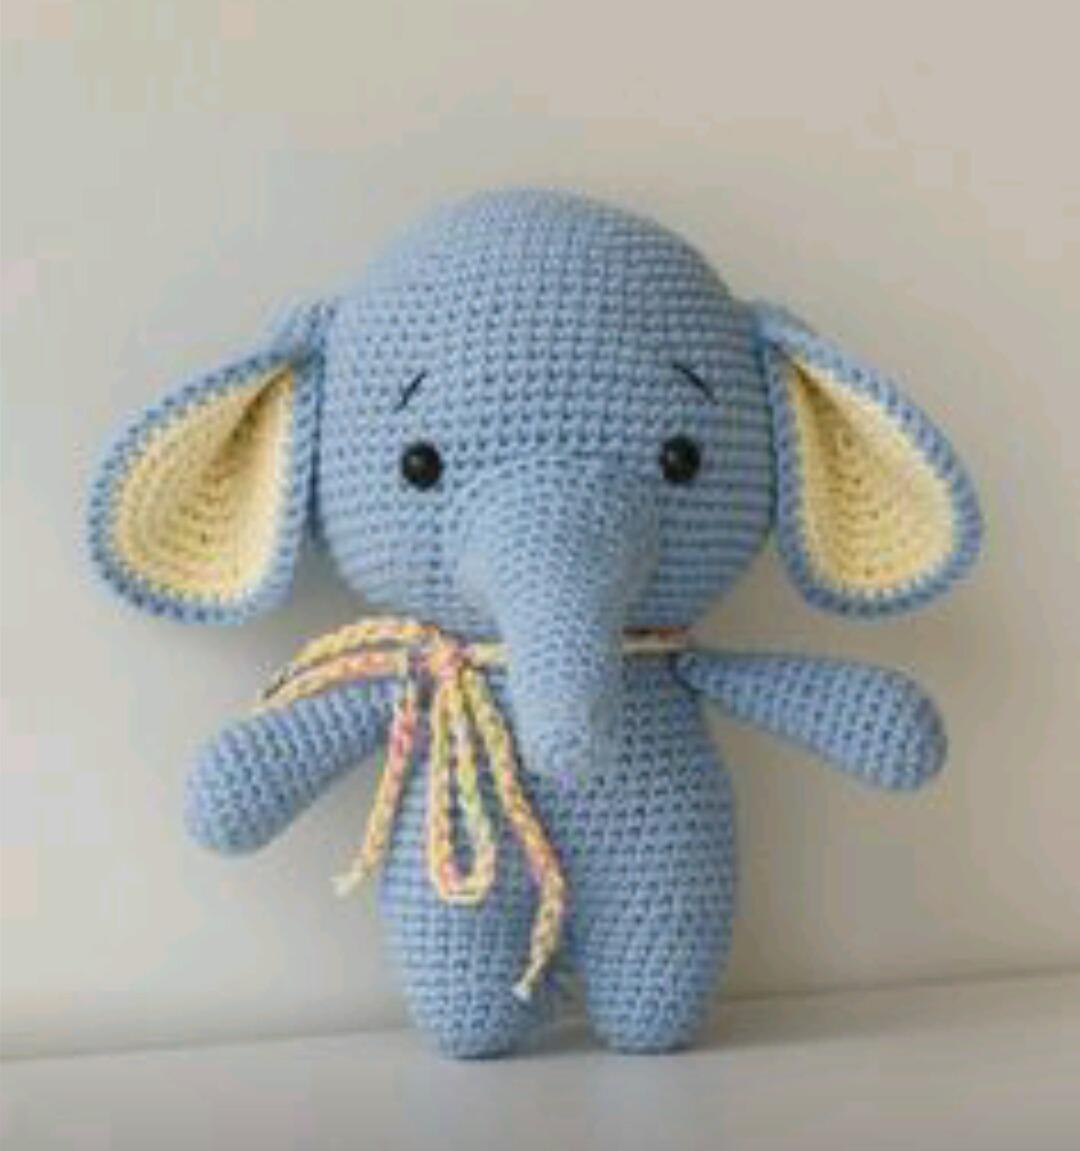 Amigurumi elefantinha | Elefante de crochê, Amigurumi de animais ... | 1151x1080